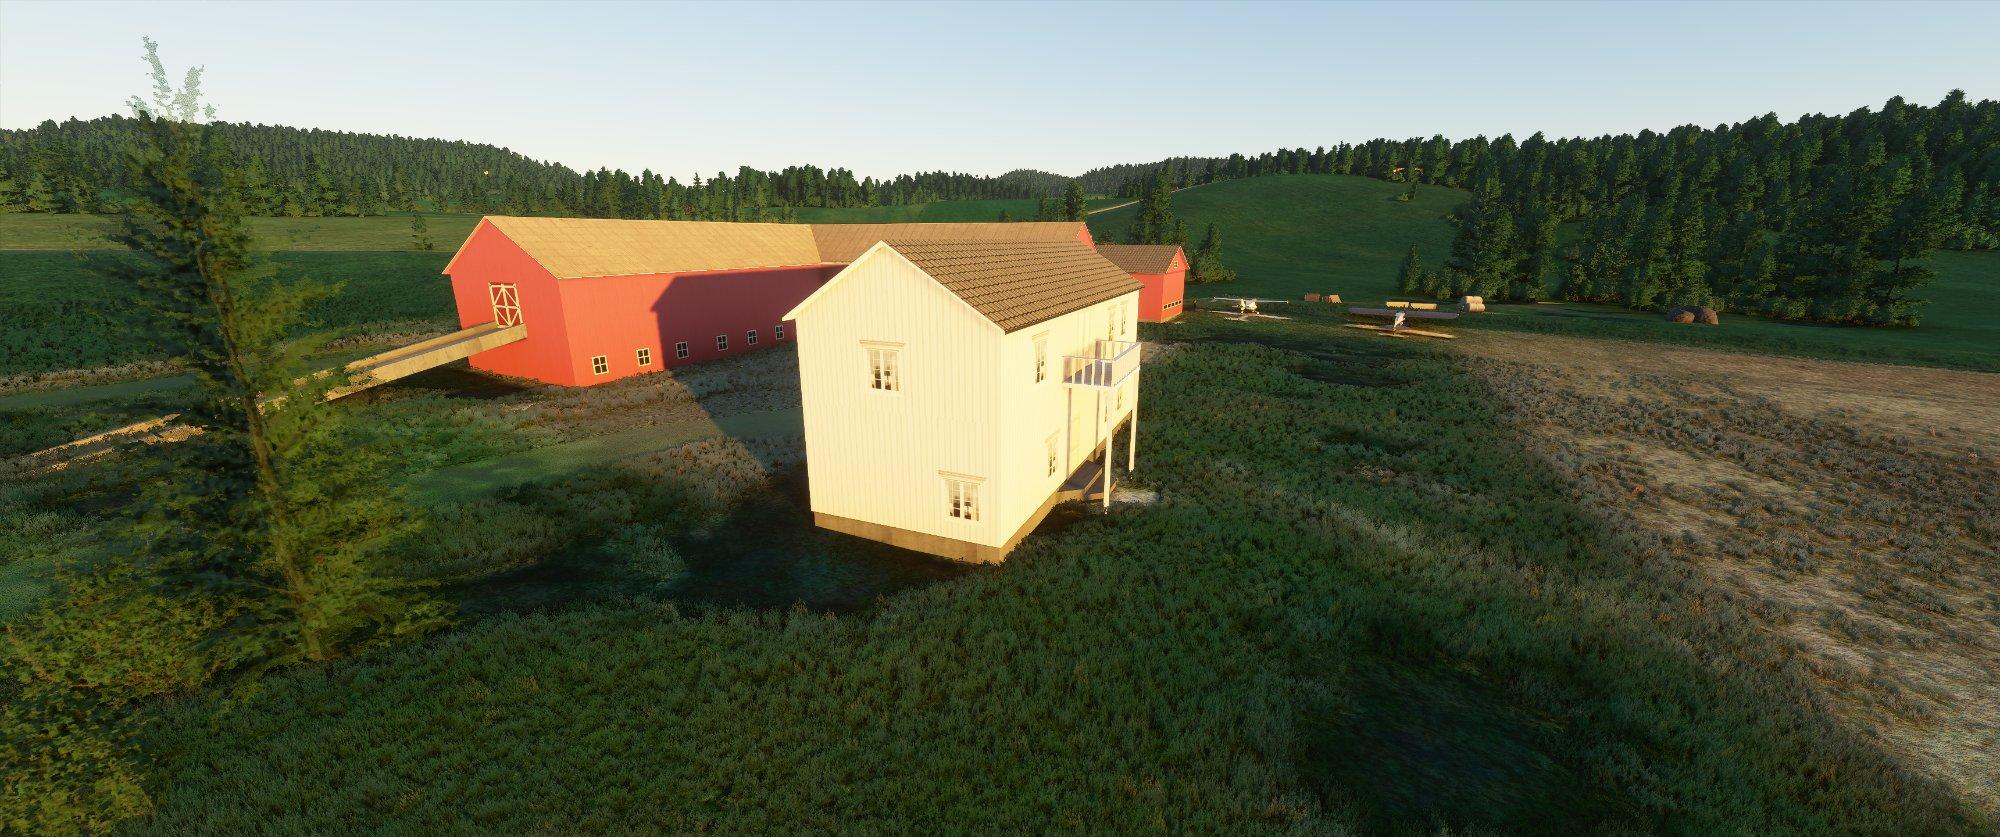 Microsoft Flight Simulator Screenshot 2020.09.28 - 16.00.13.41.jpg